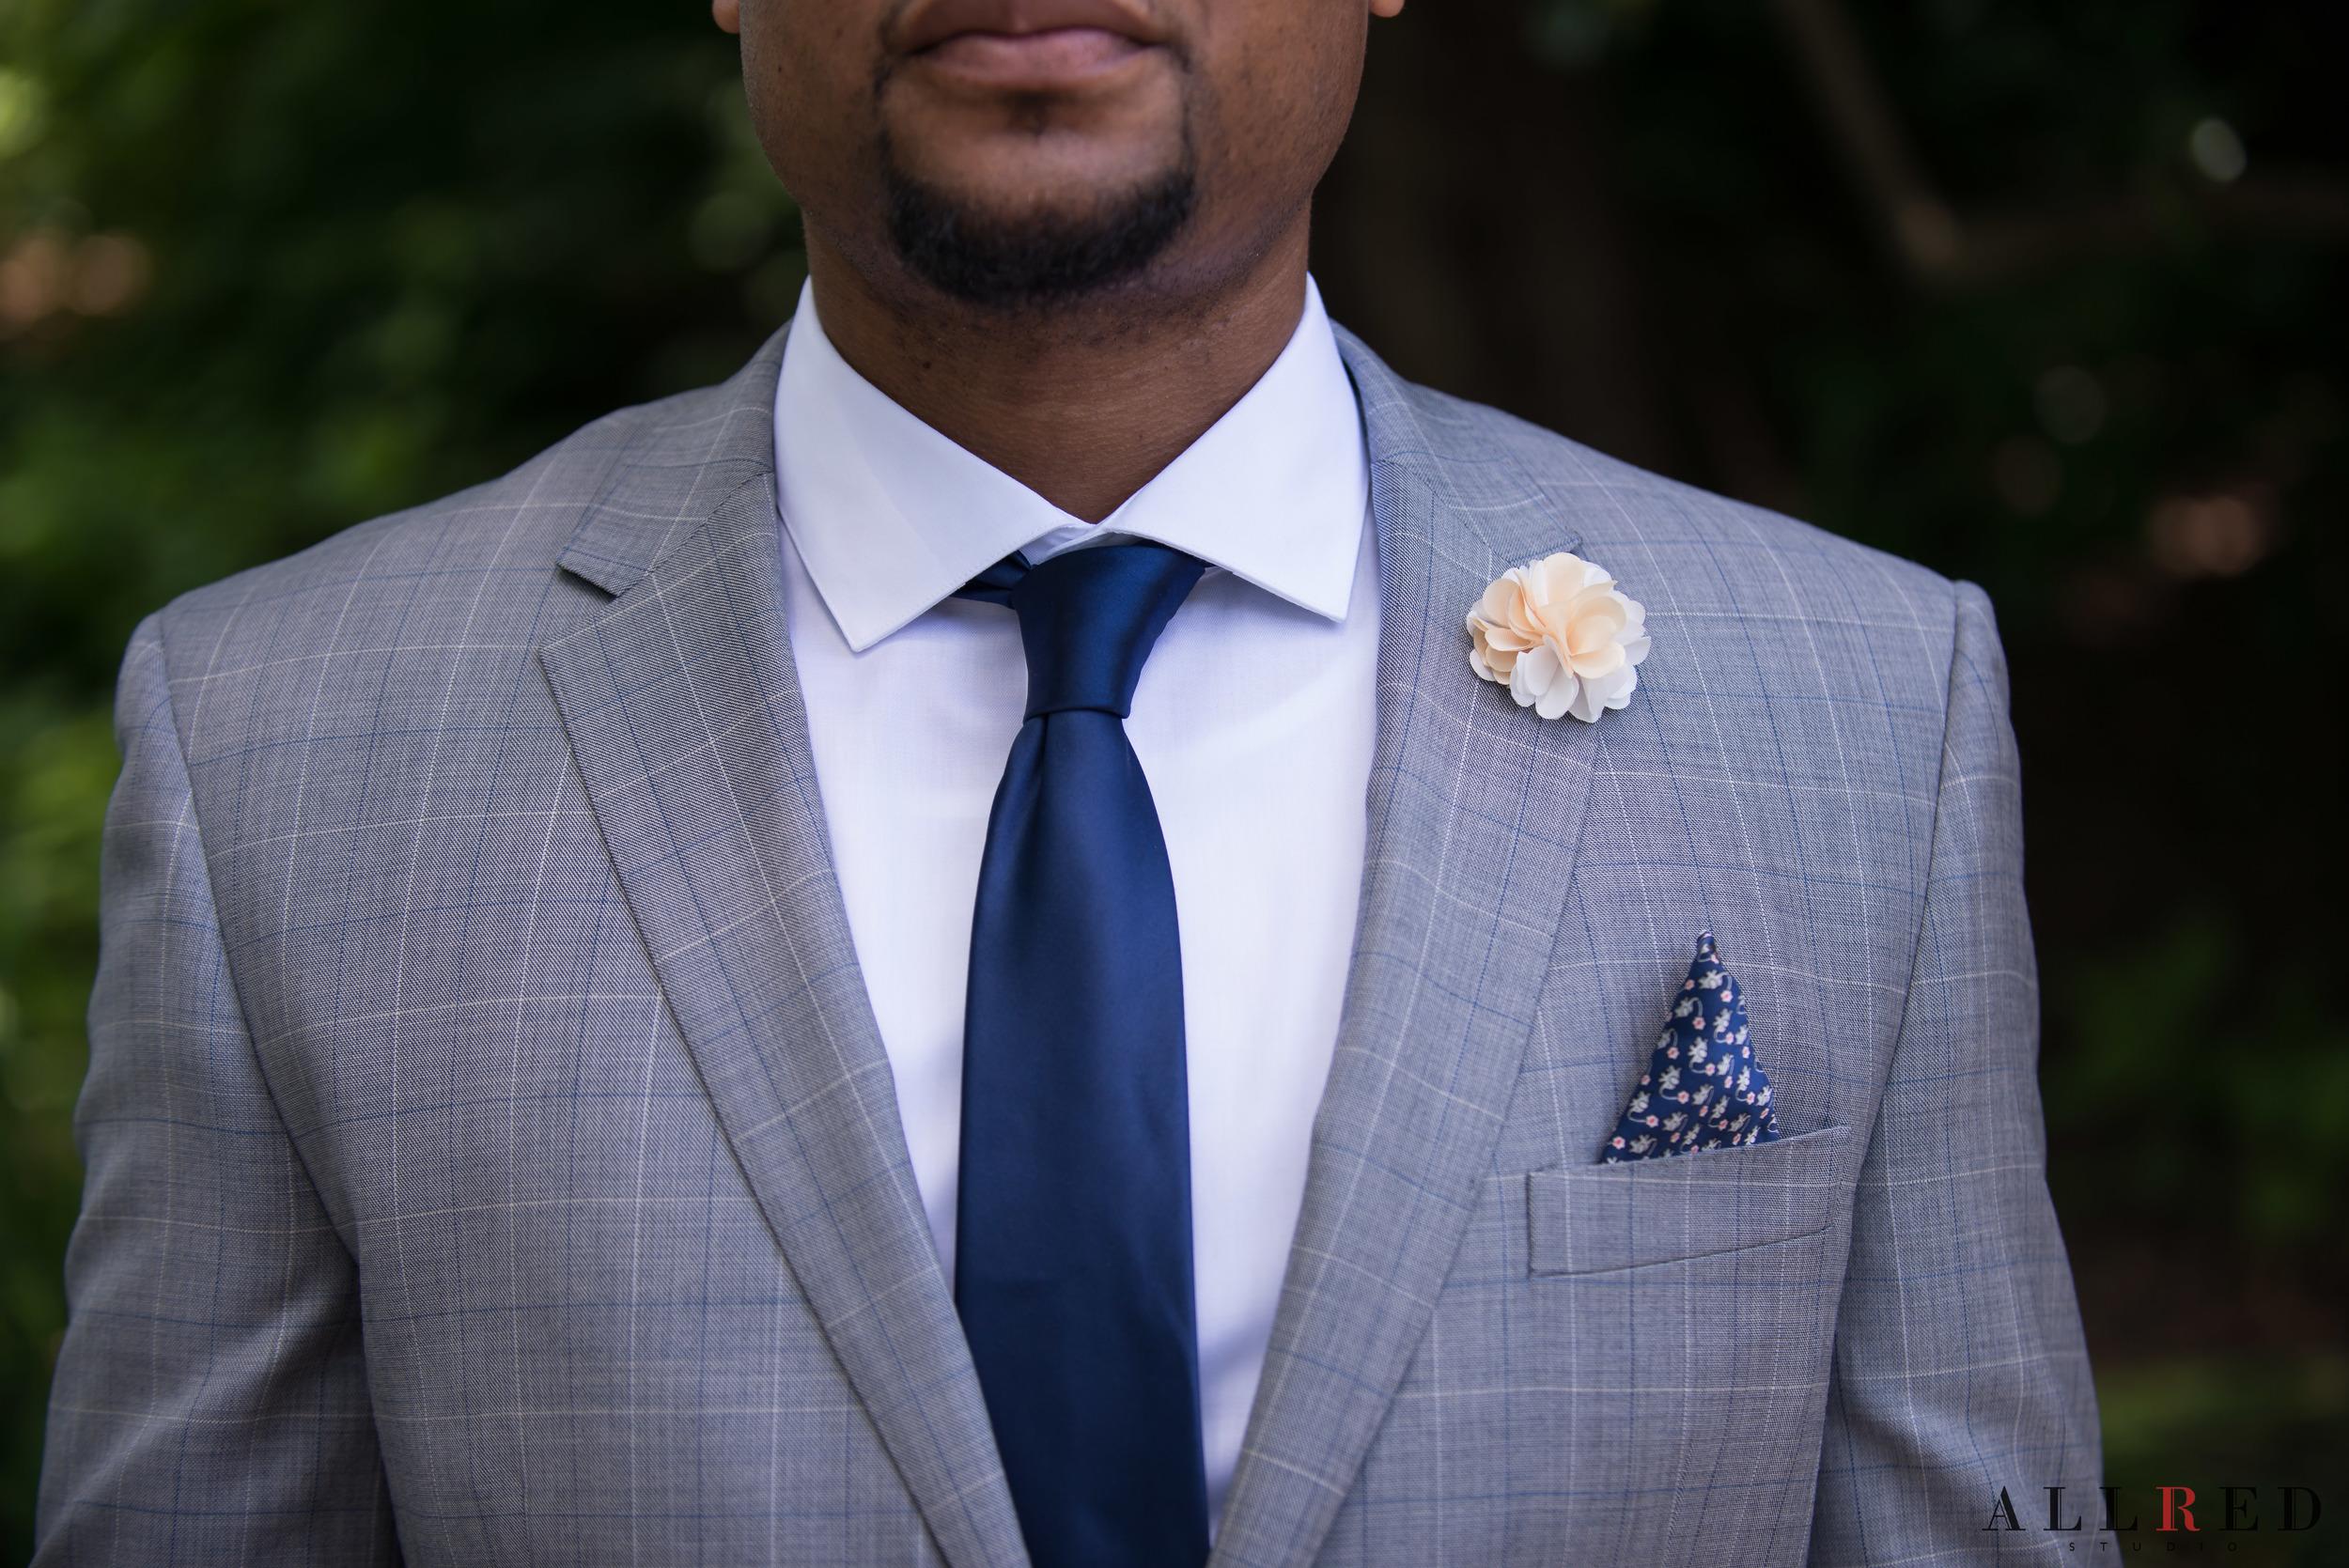 Wedding-central-park-allred-studio-new-york-photographer-new-jersey-hudson-valley-2560.jpg